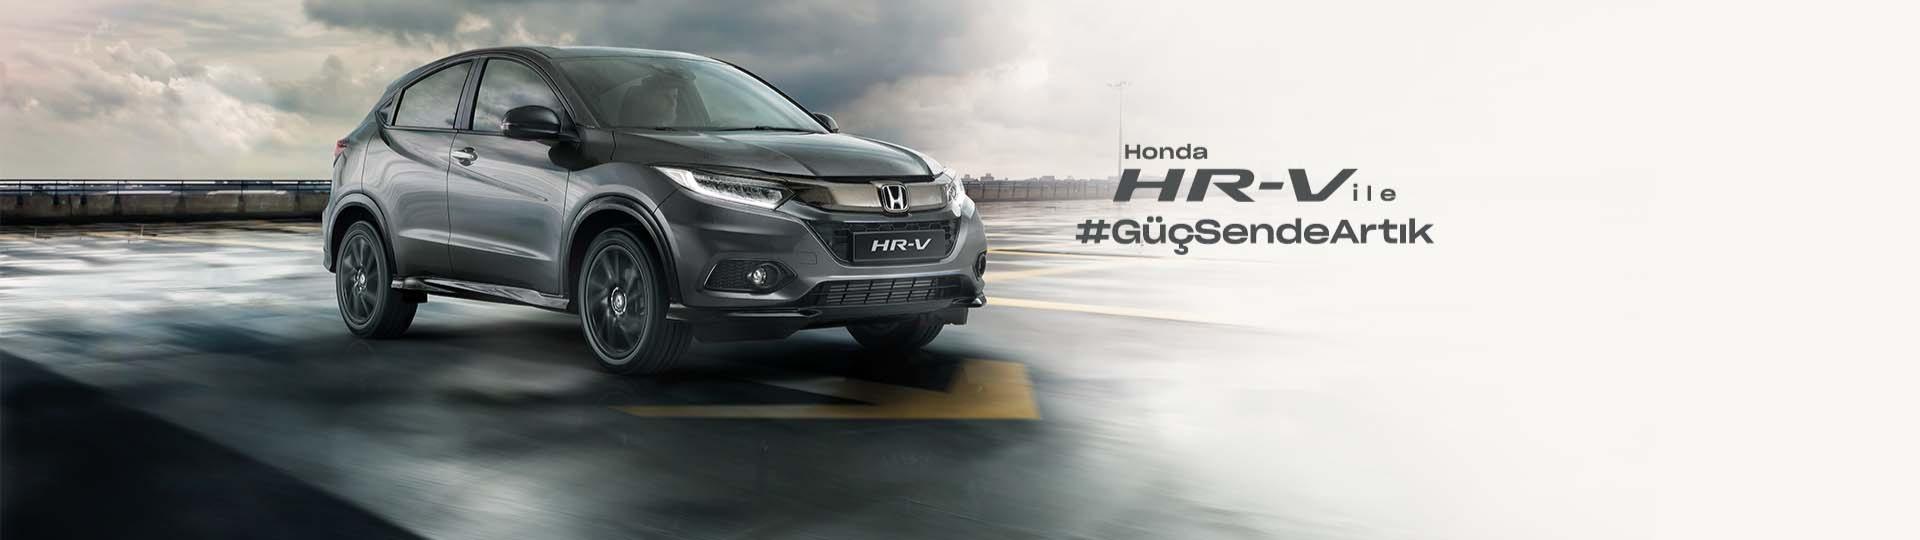 Honda Plaza  Park Honda HR-V, 70.000 TL, 15 ay vade ve %0,80 faiz avantajıyla Honda Showroom'larında sizi bekliyor.